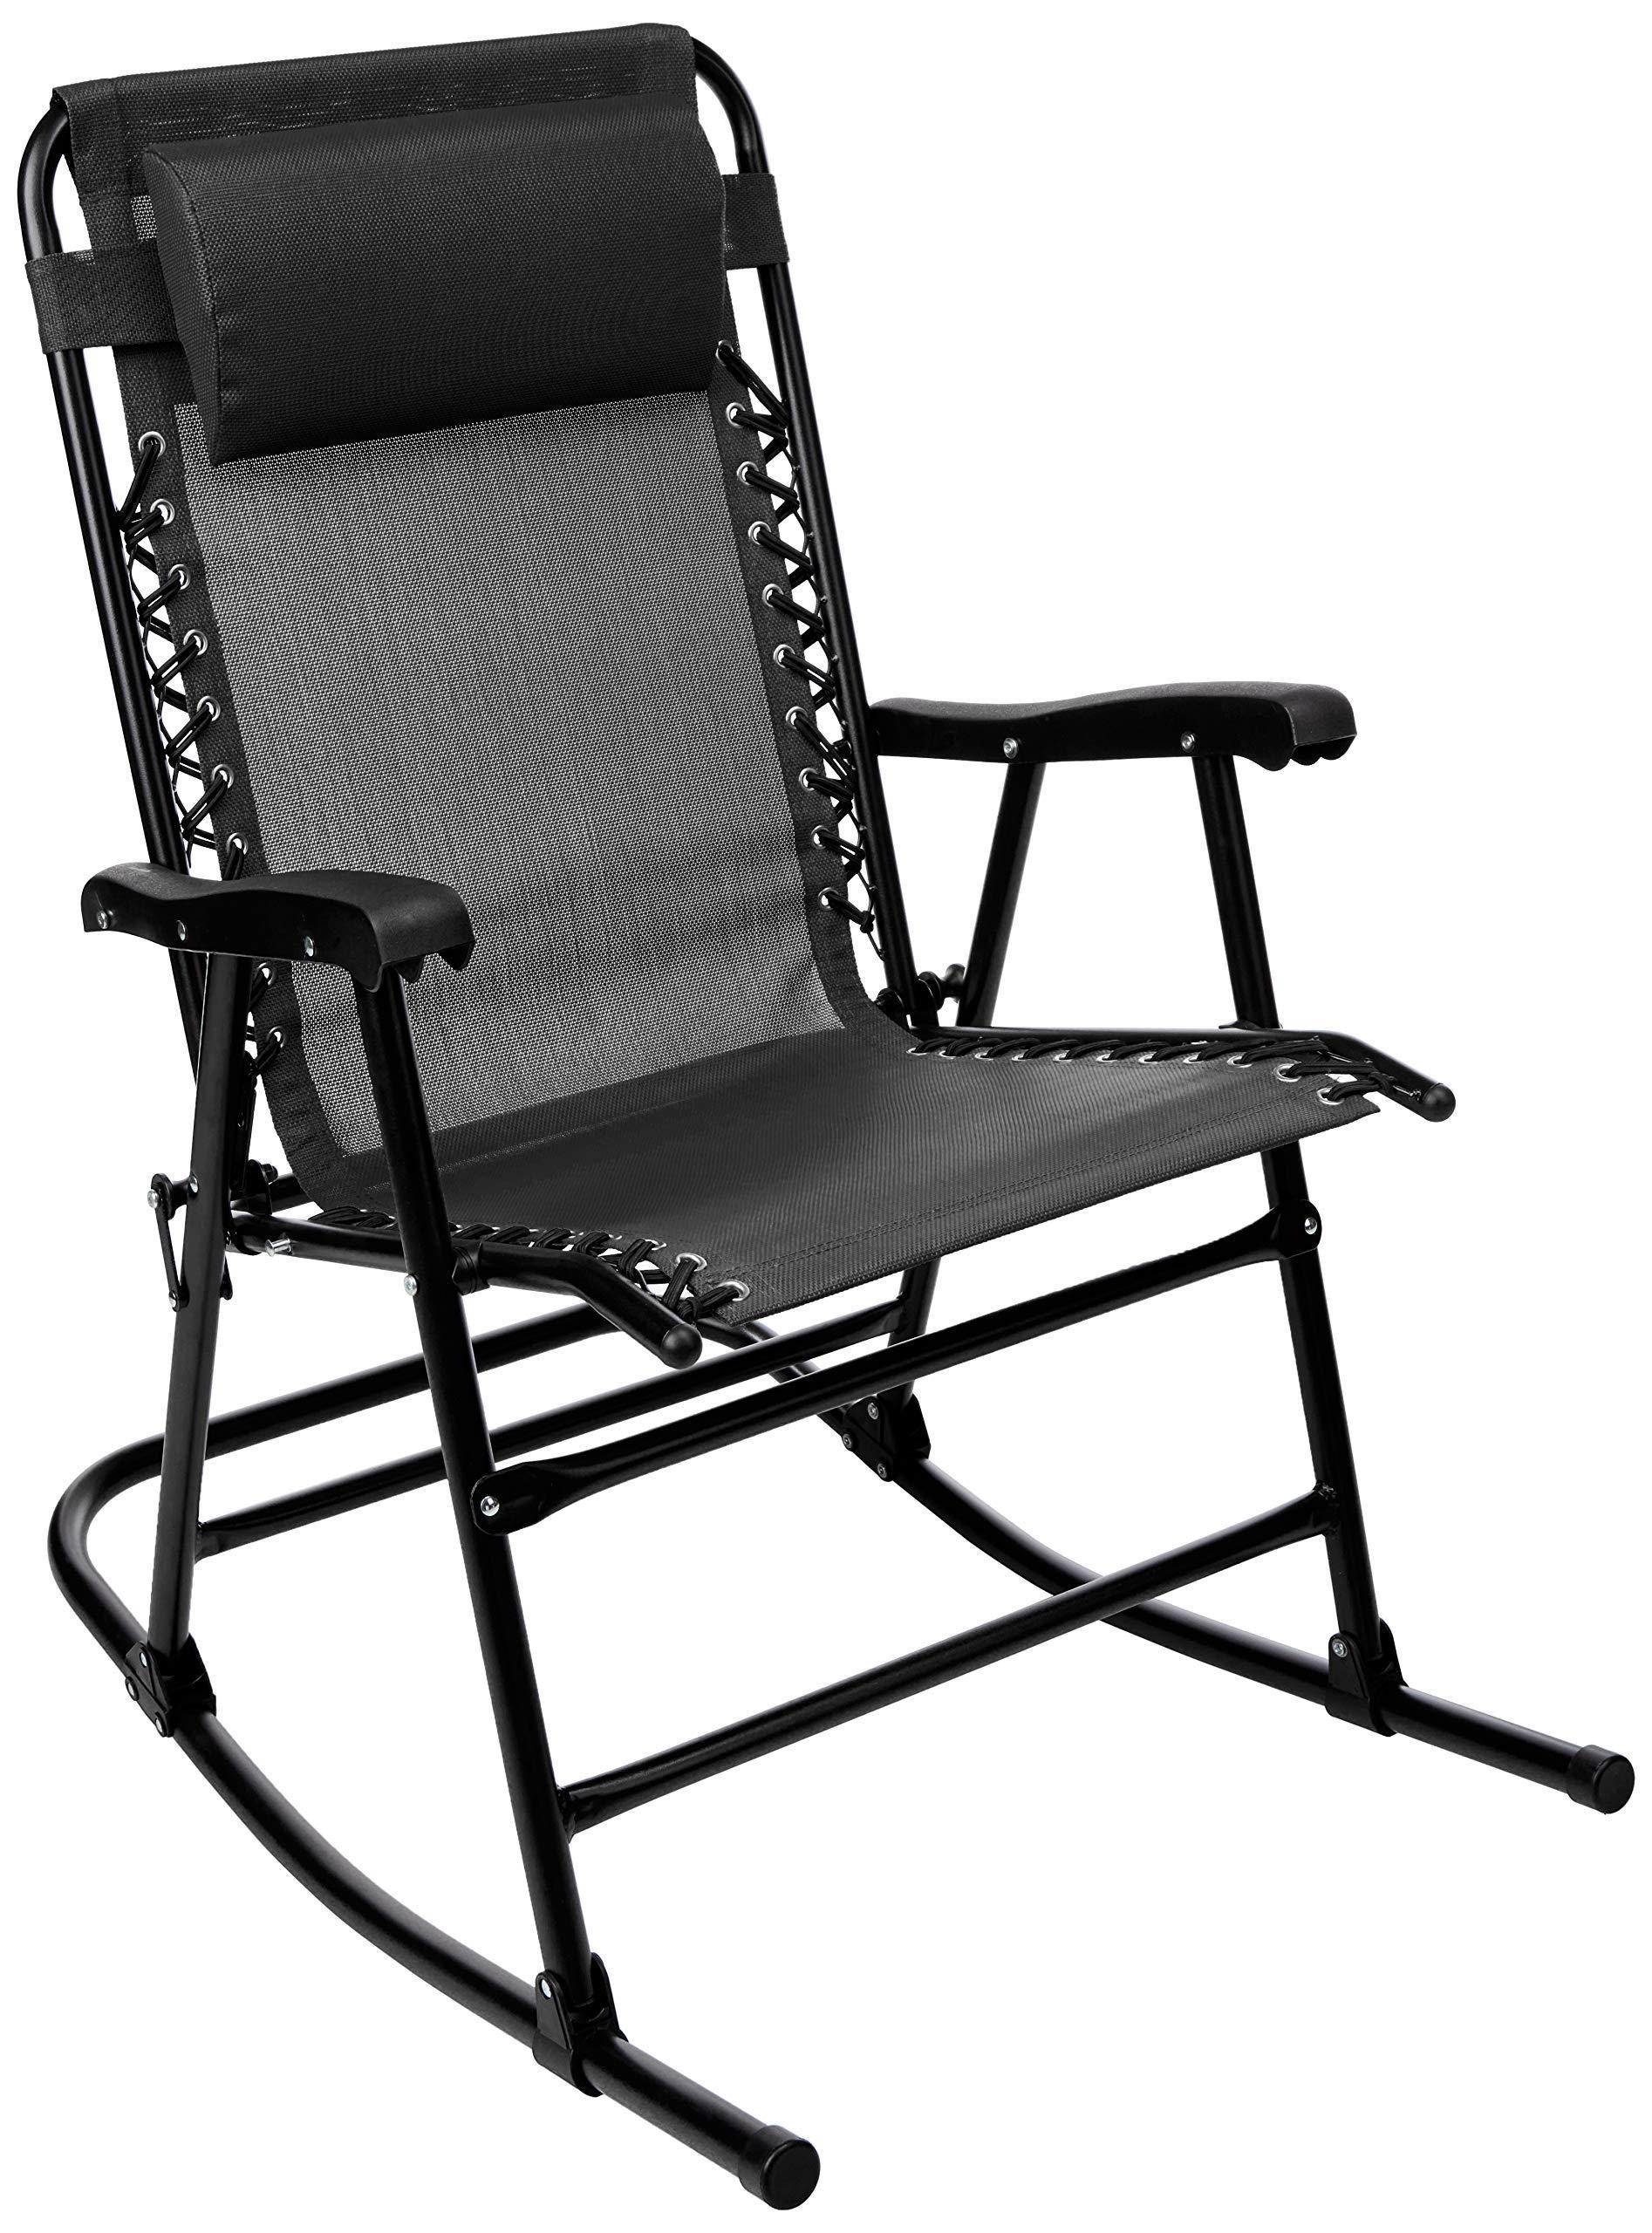 AmazonBasics Foldable Rocking Chair - Black (Renewed) by AmazonBasics